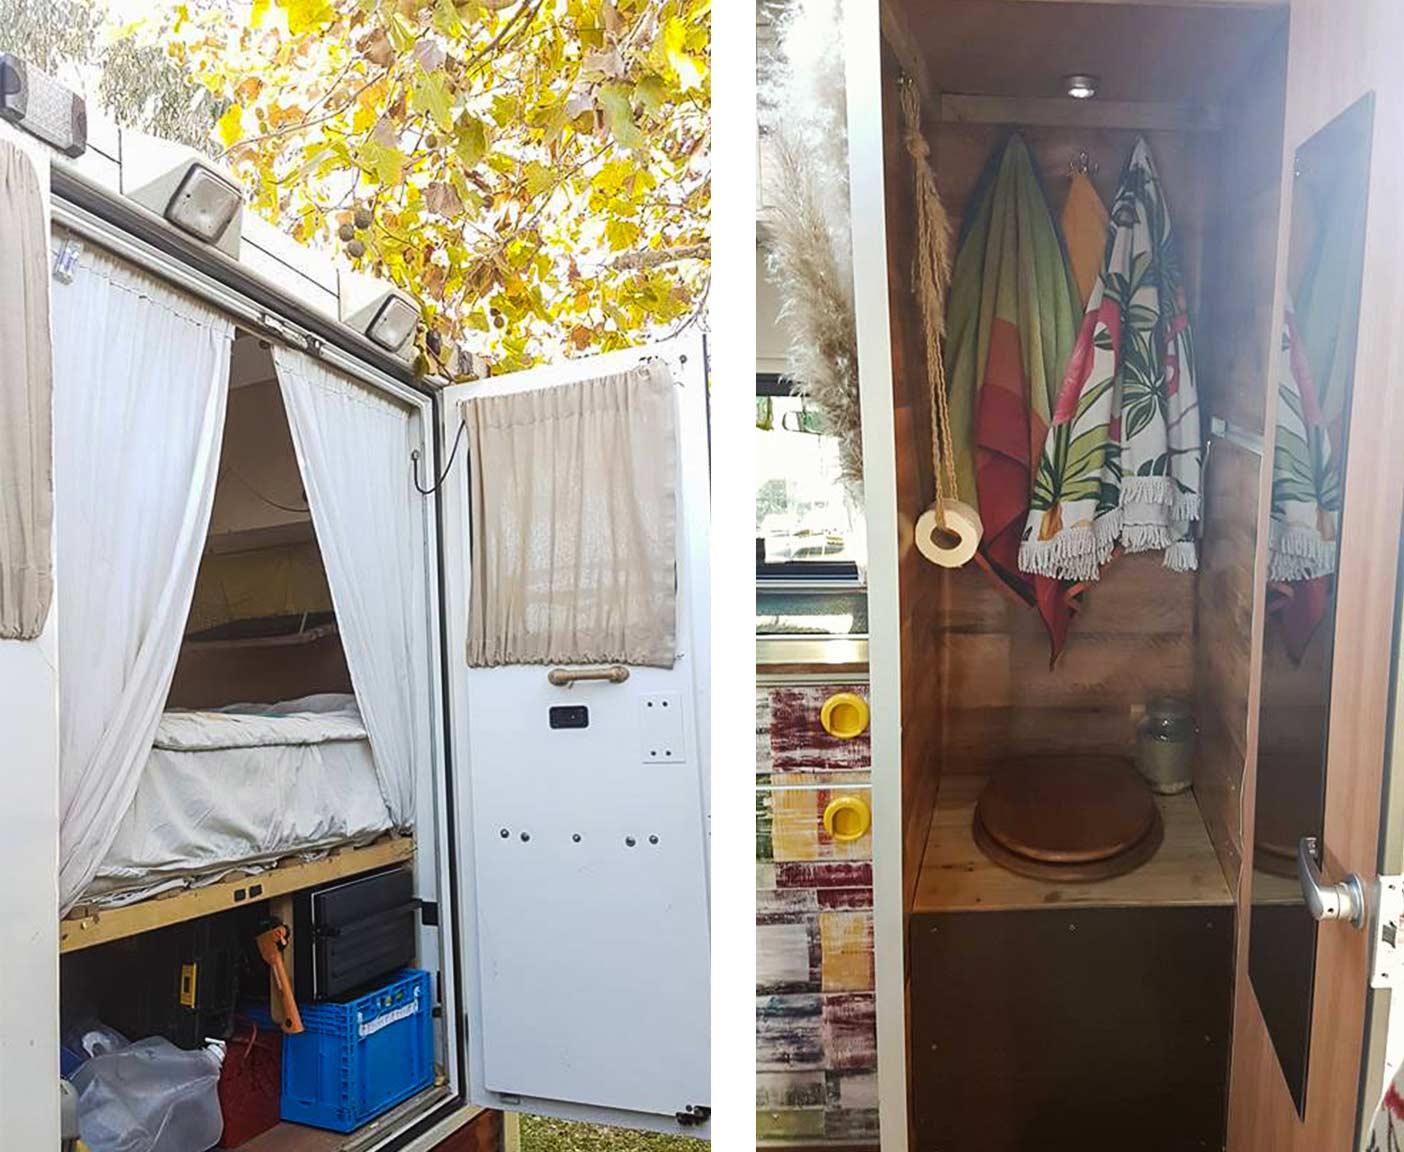 sprinter-mercedes-selbstausbau-wohnmobil-van-camper-campingbus-9